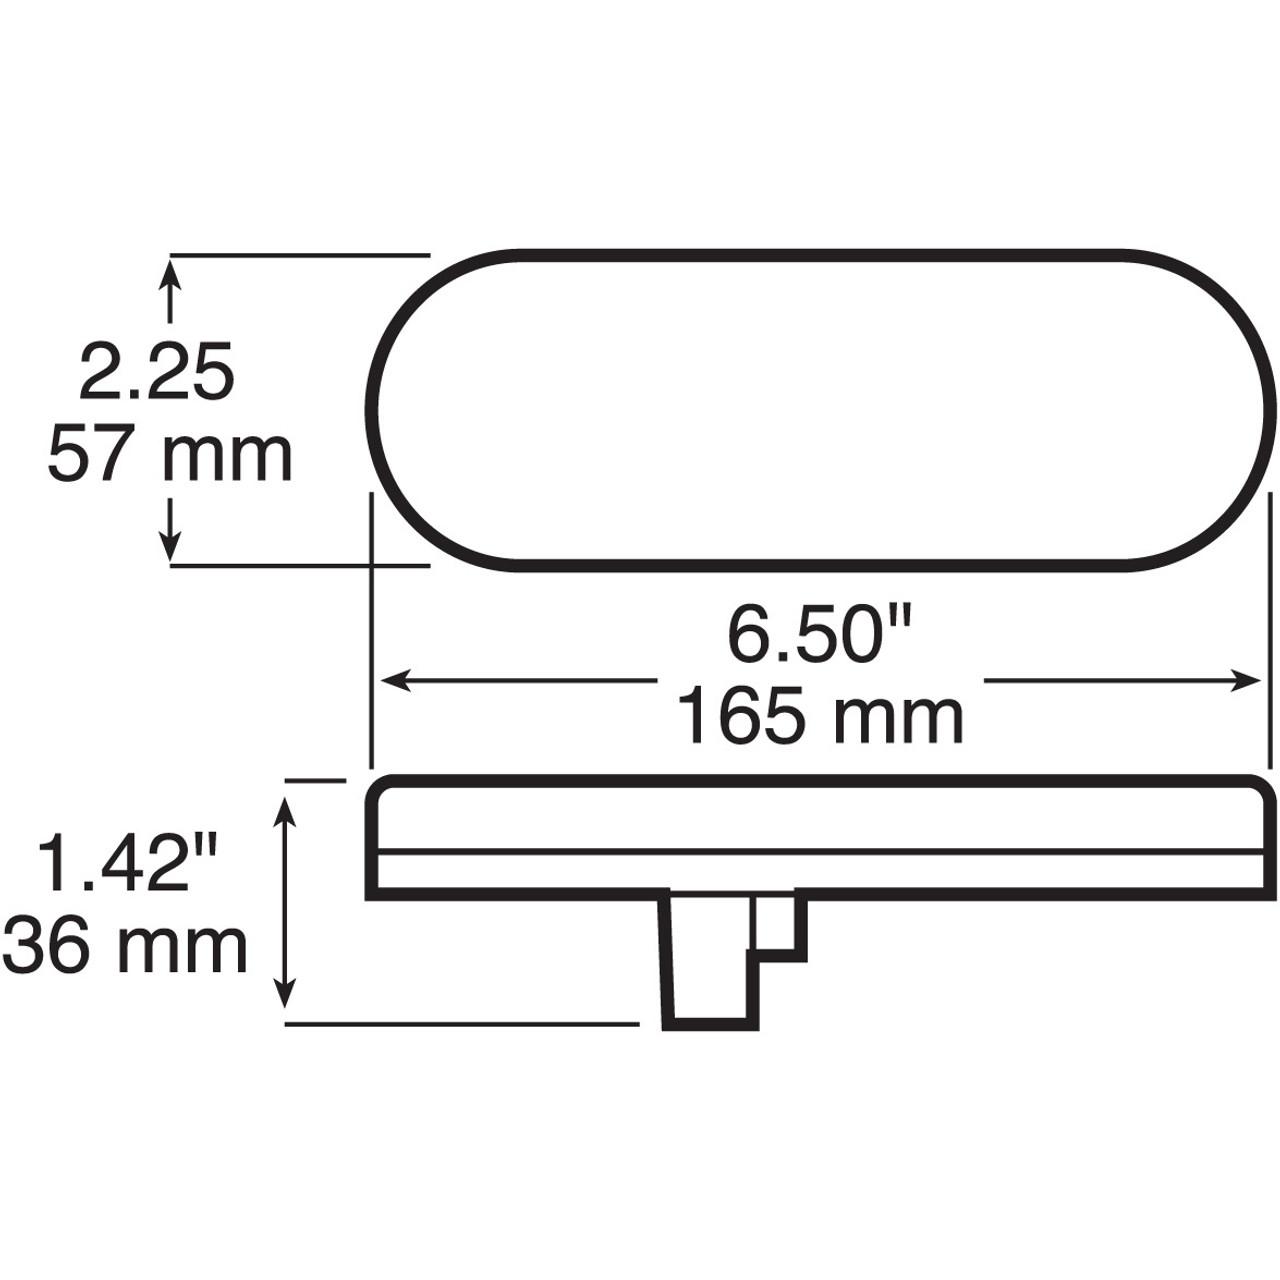 LED421KR10 --- Oval Sealed LED Turn Light Kit - 10 Diodes